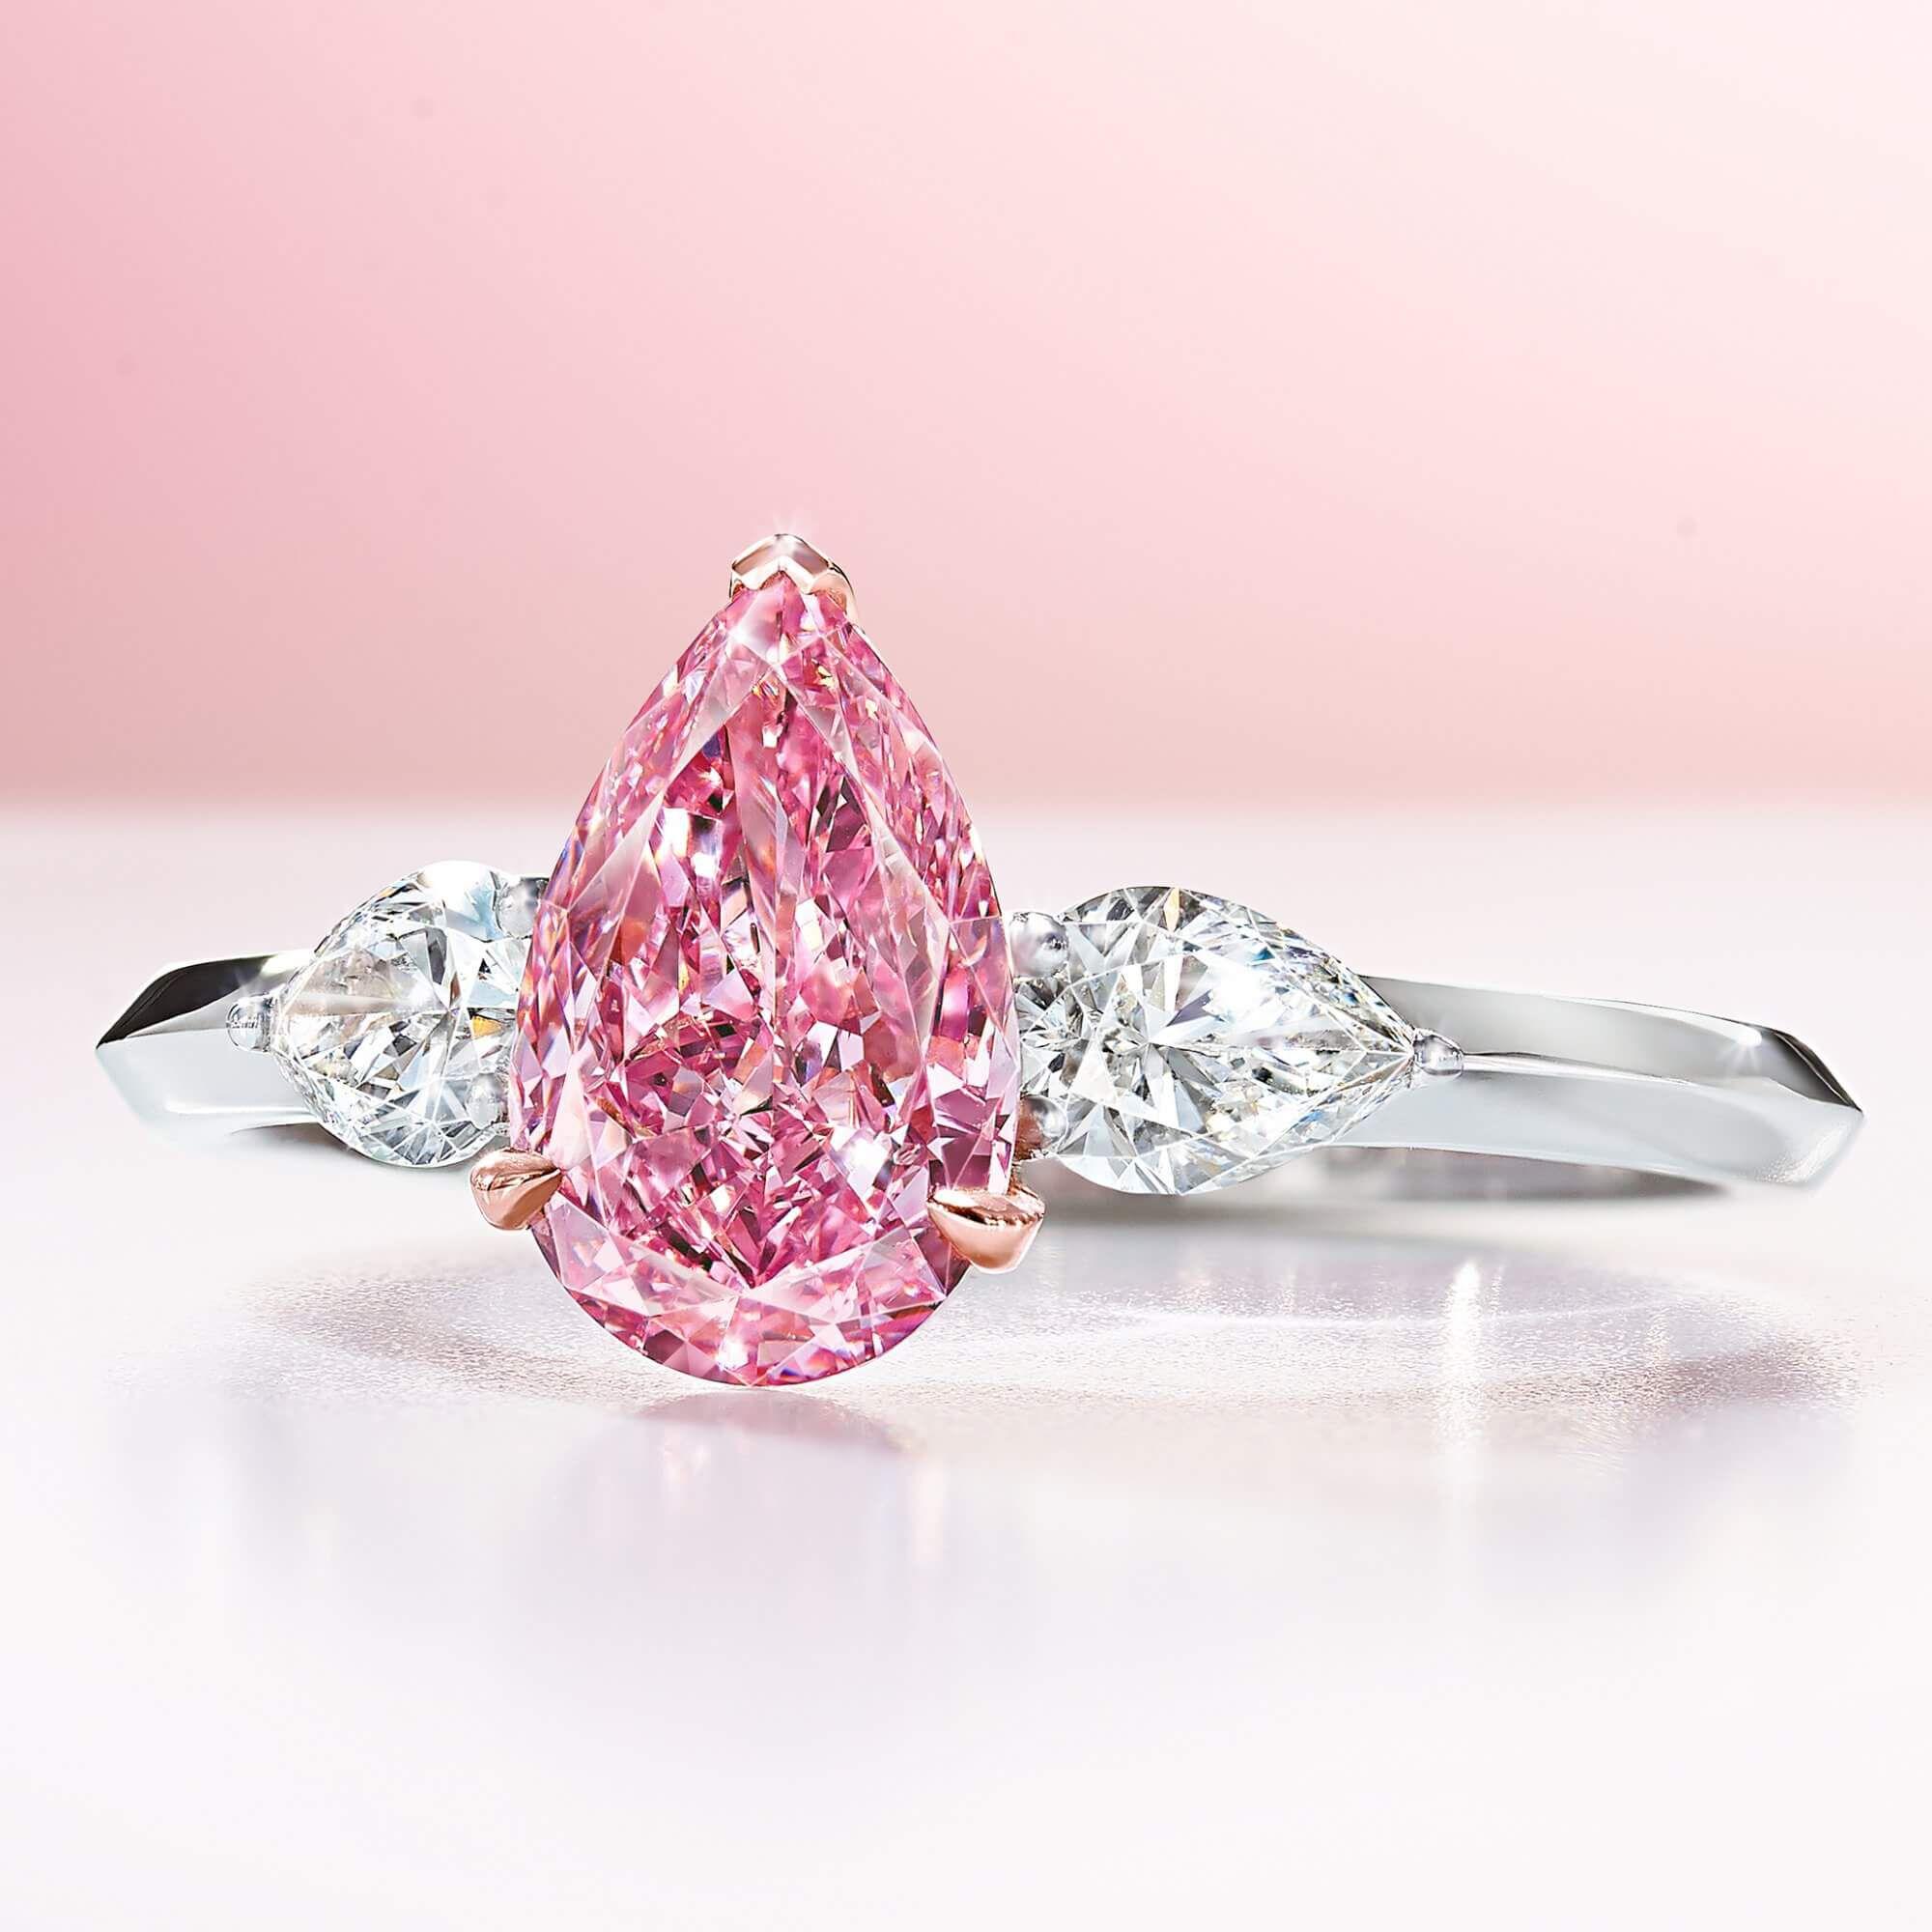 A 1.10 ct Fancy Vivid Pear Shape Pink Graff Diamond Ring - GR70875